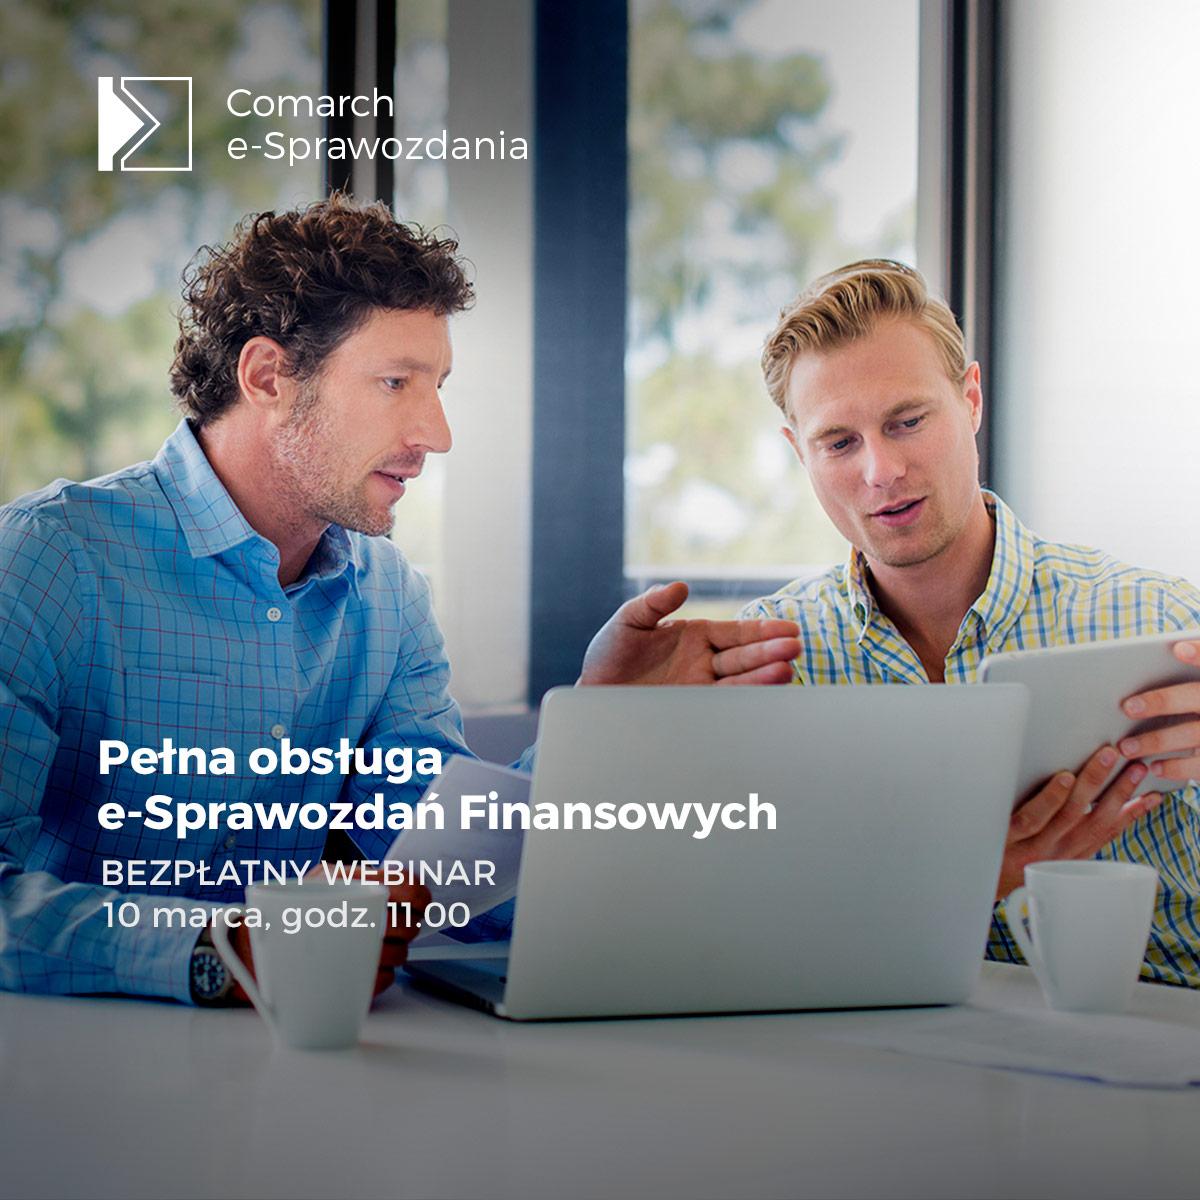 Comarch e-sprawozdania